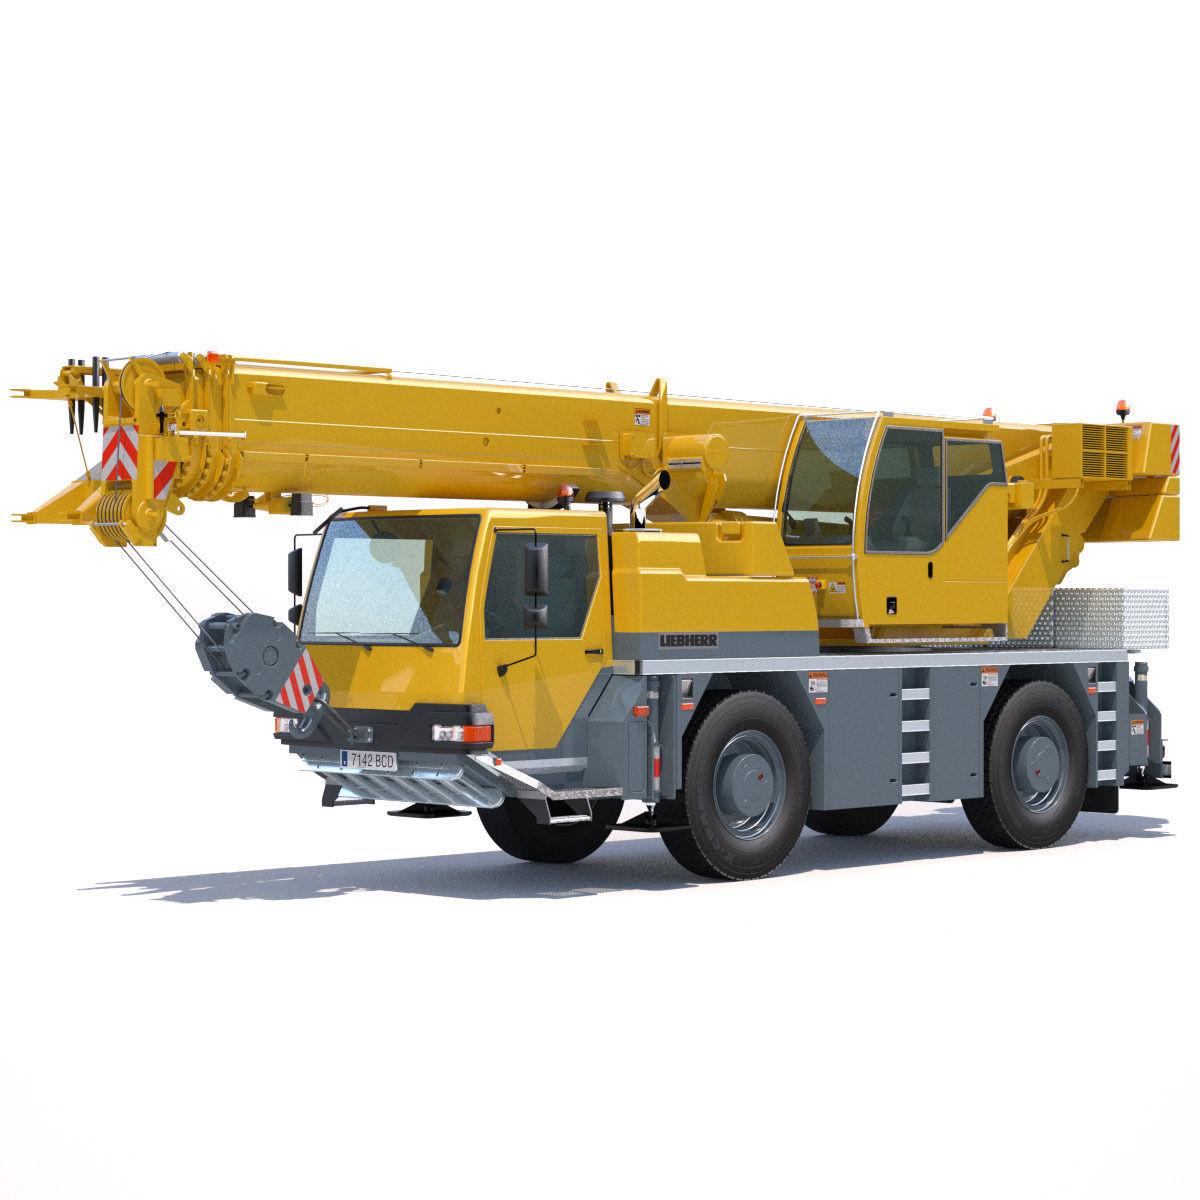 Mobile Crane Liebherr Ltm 1040 2 1 3d Model Max Obj 3ds